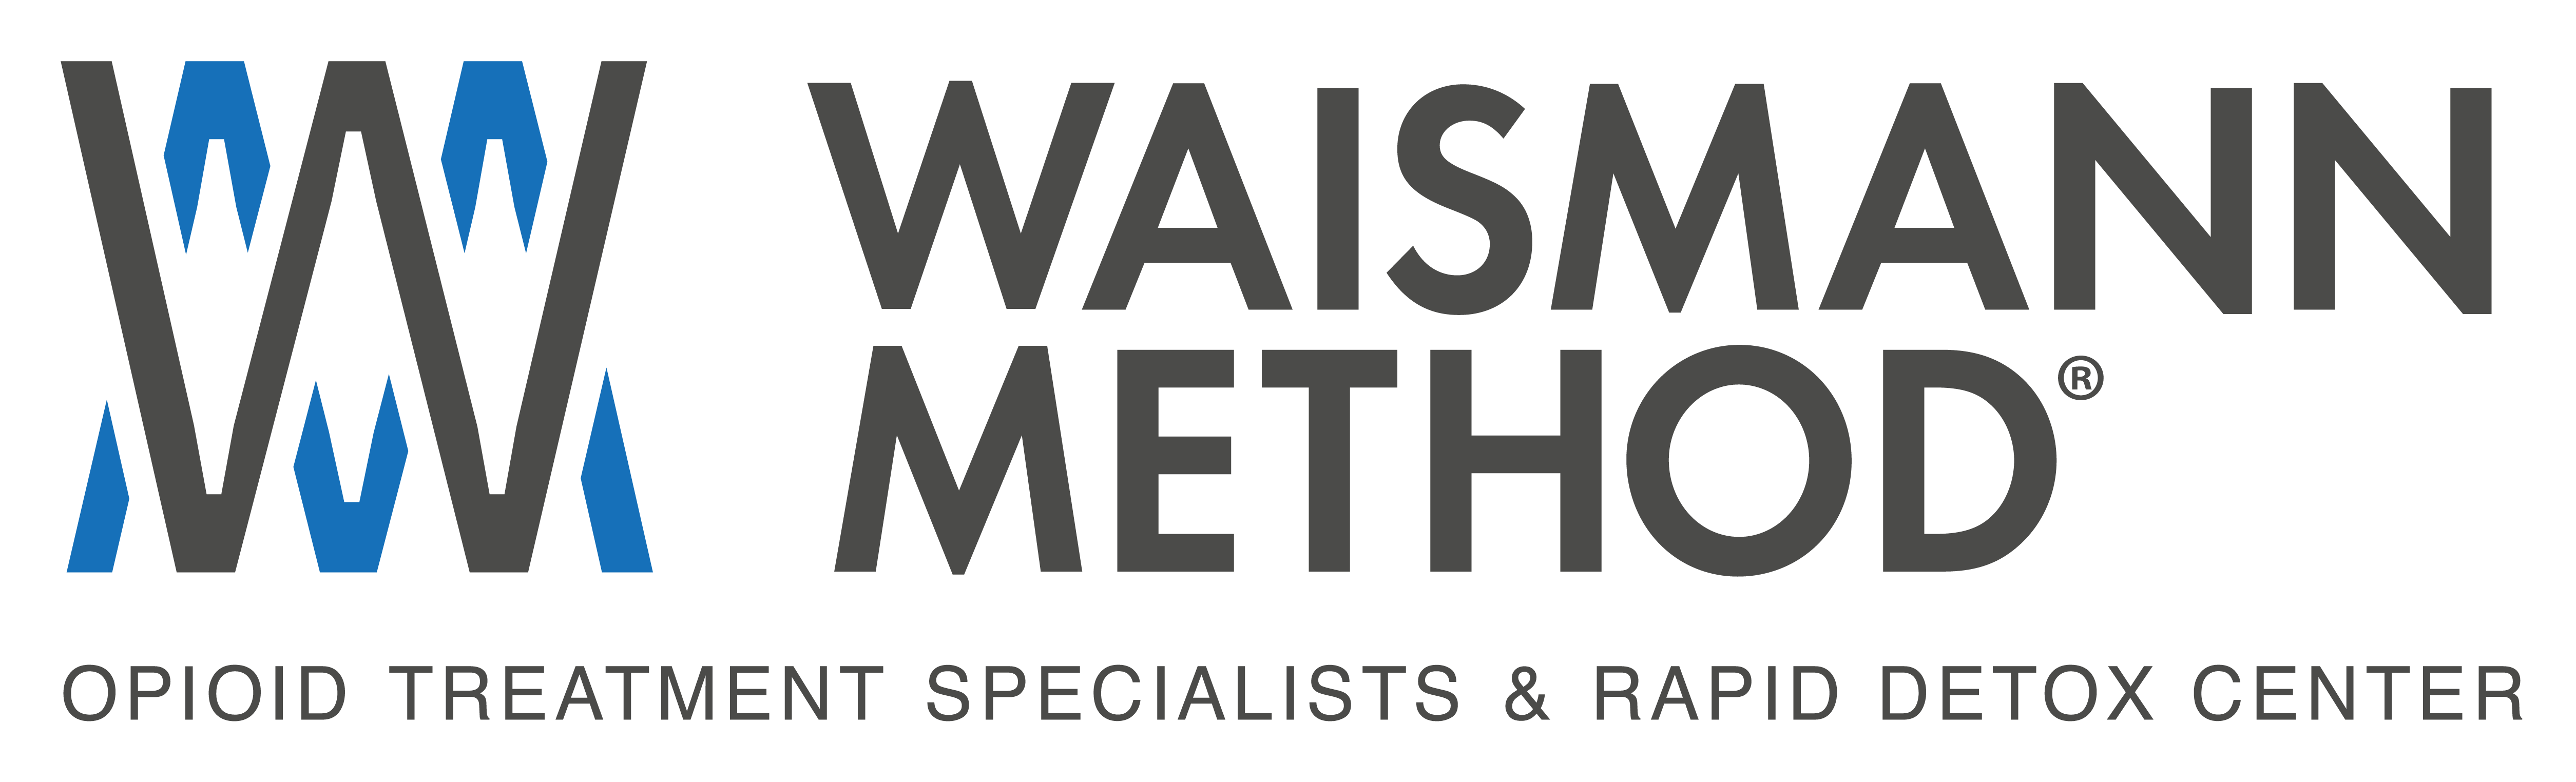 waismann method logo hi res 2 1